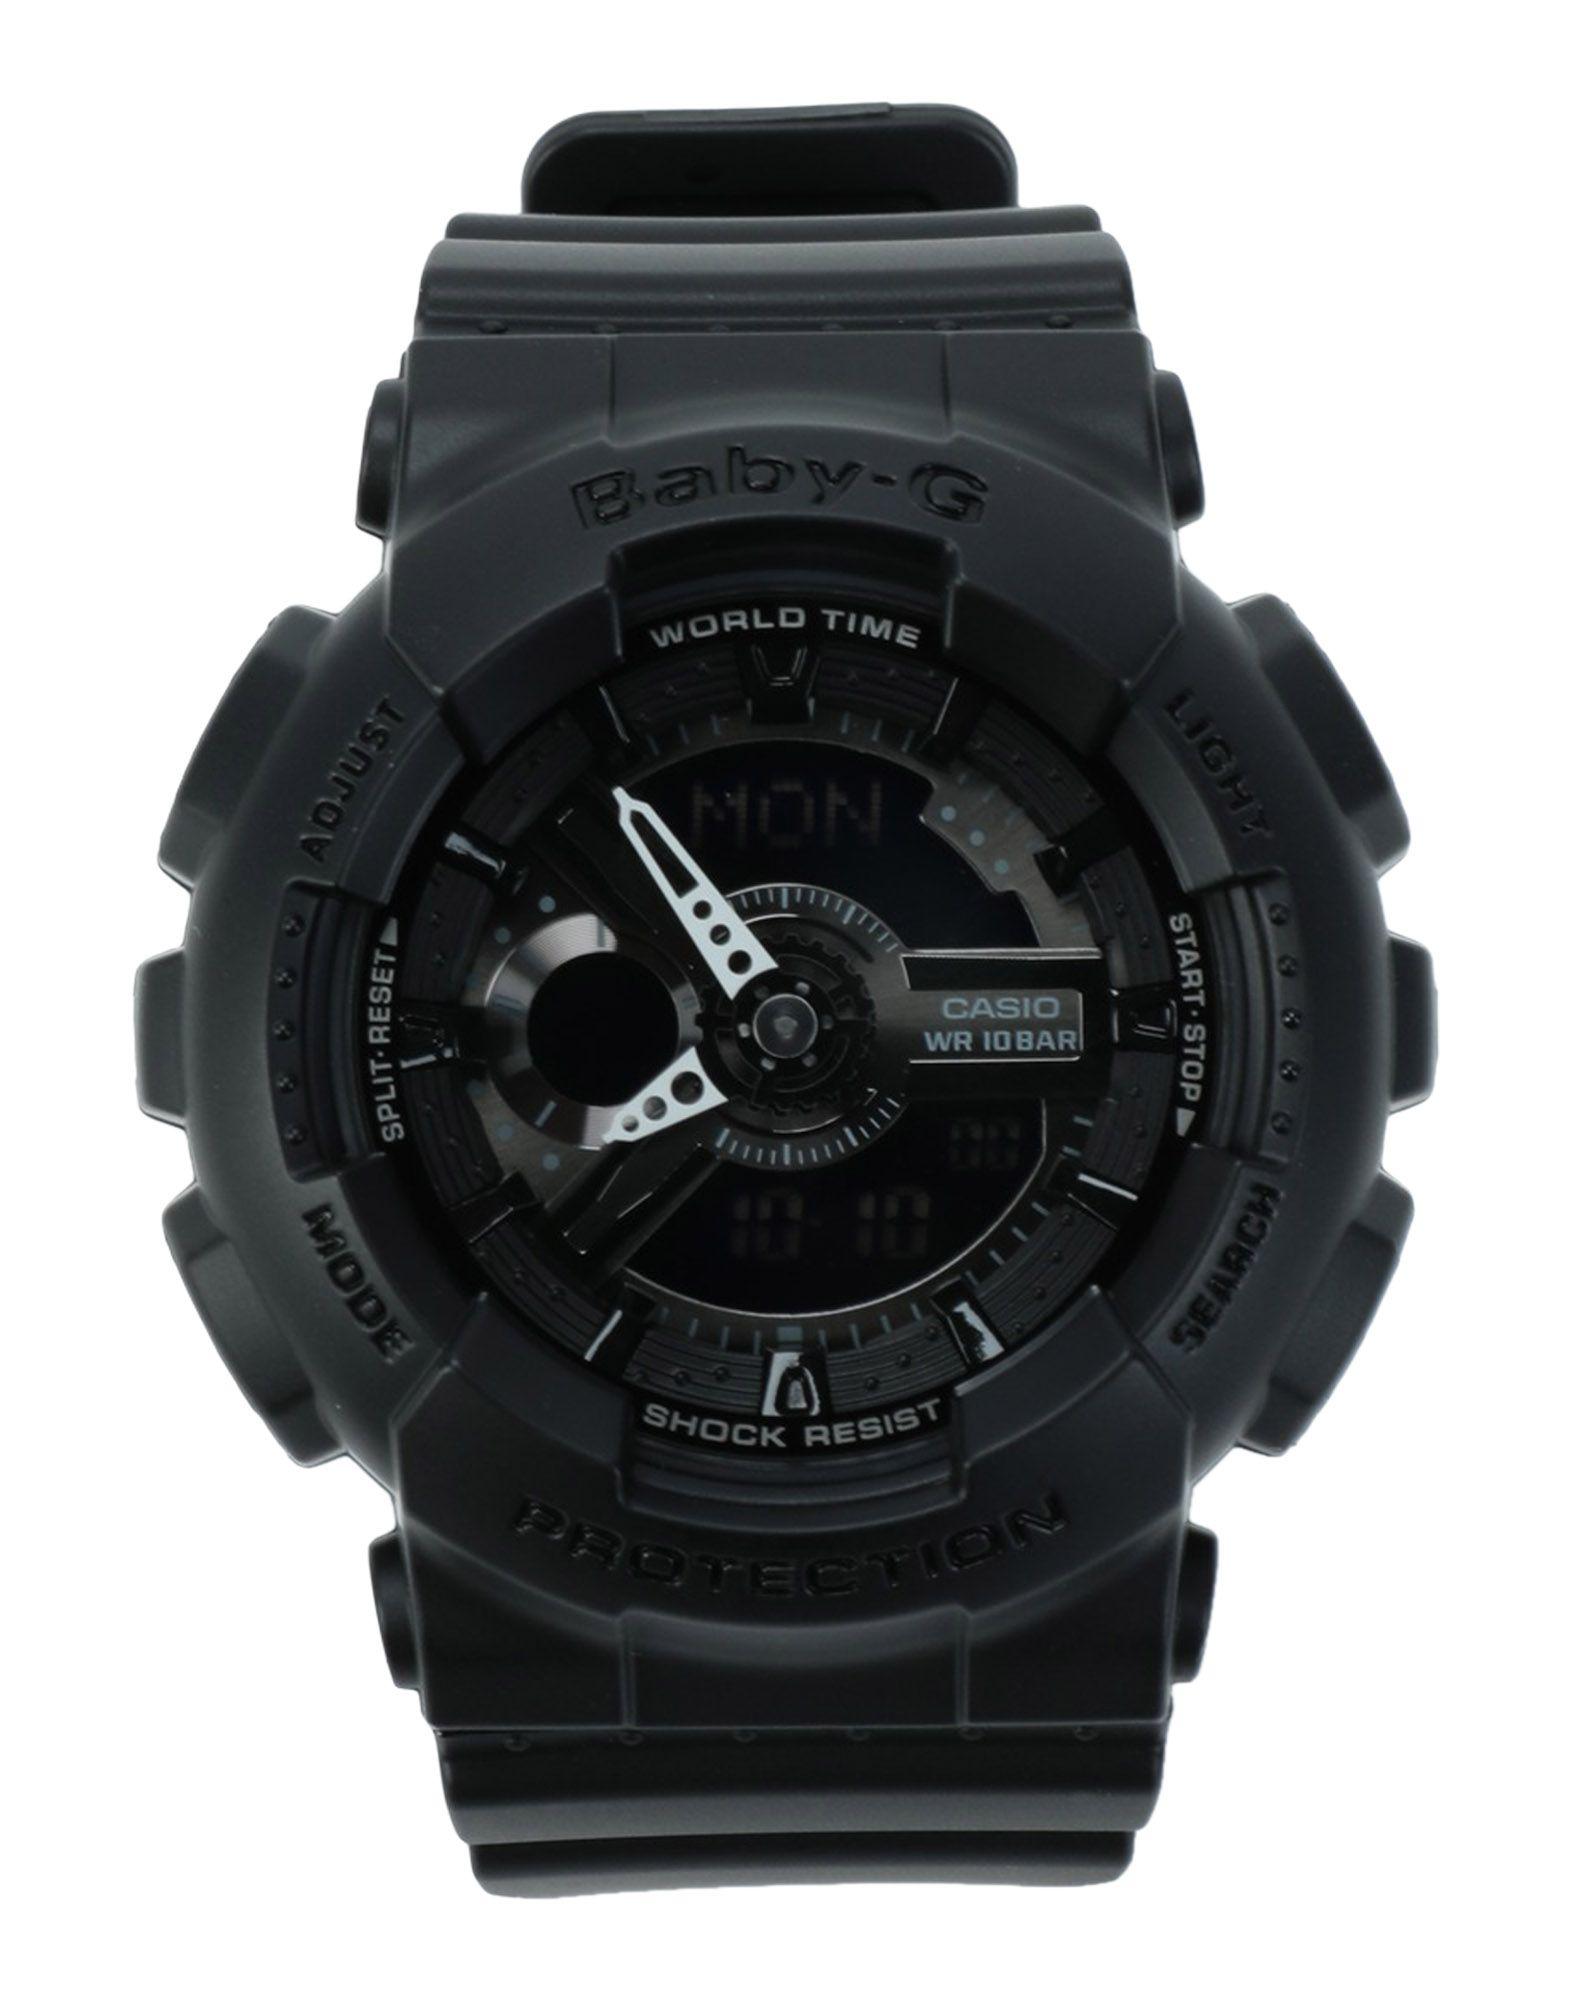 CASIO BABY-G Наручные часы casio часы casio bga 180 9b коллекция baby g